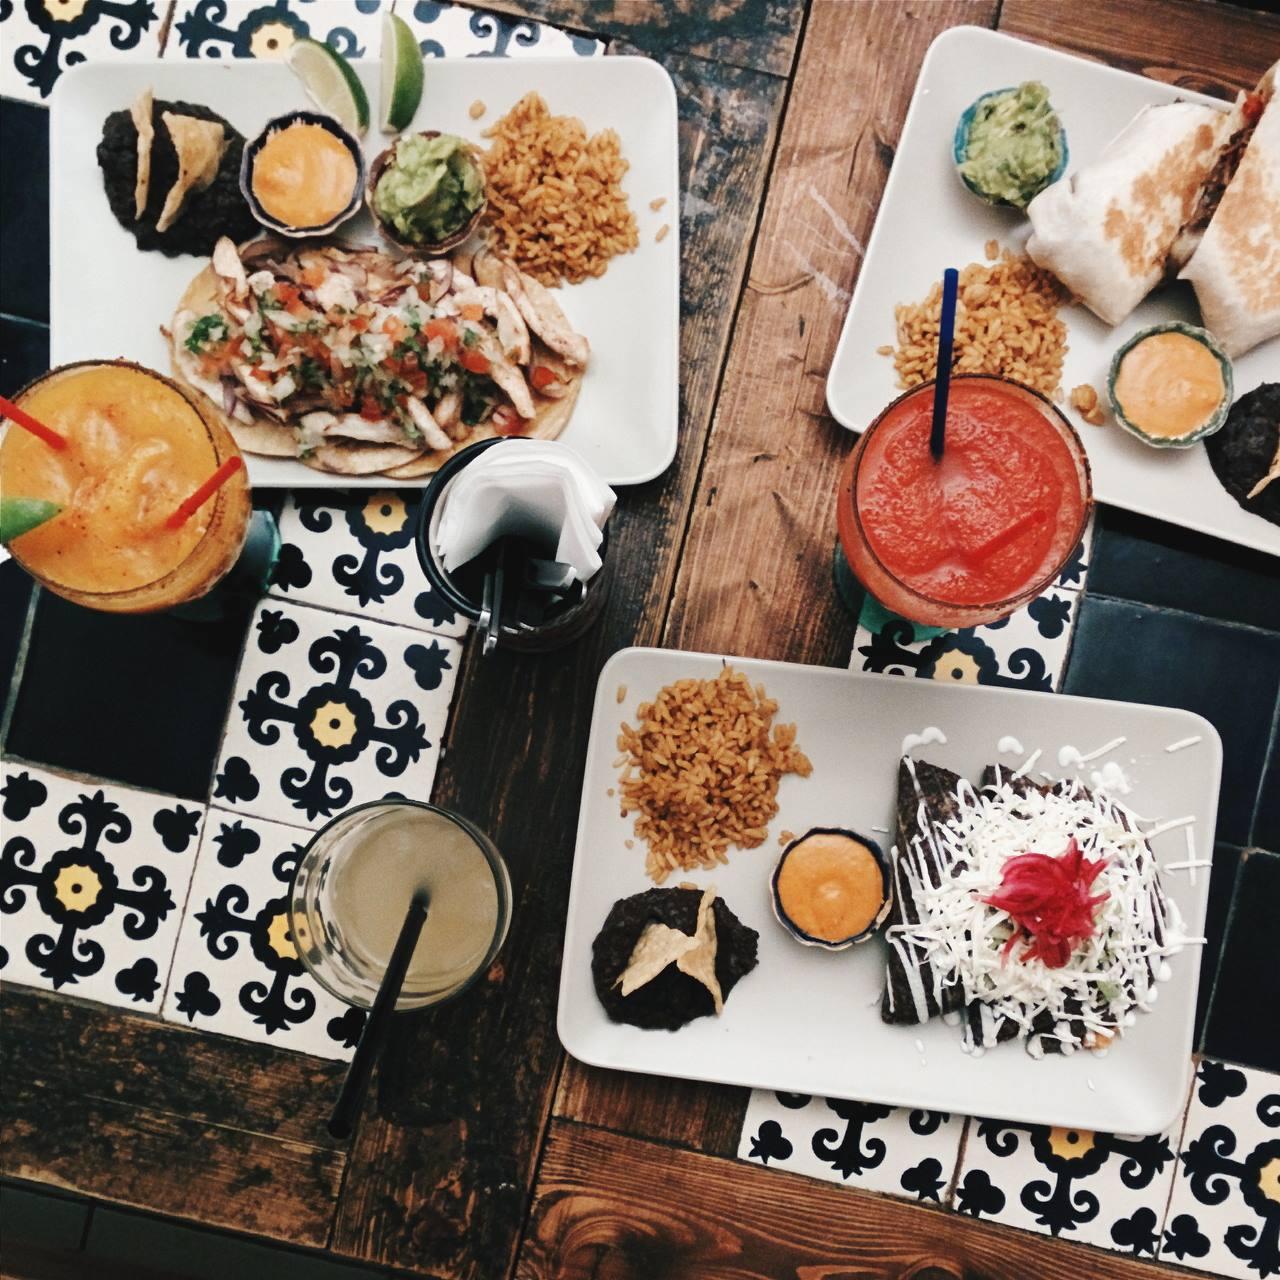 allegro's cafe - Belisario Dominguez 1403